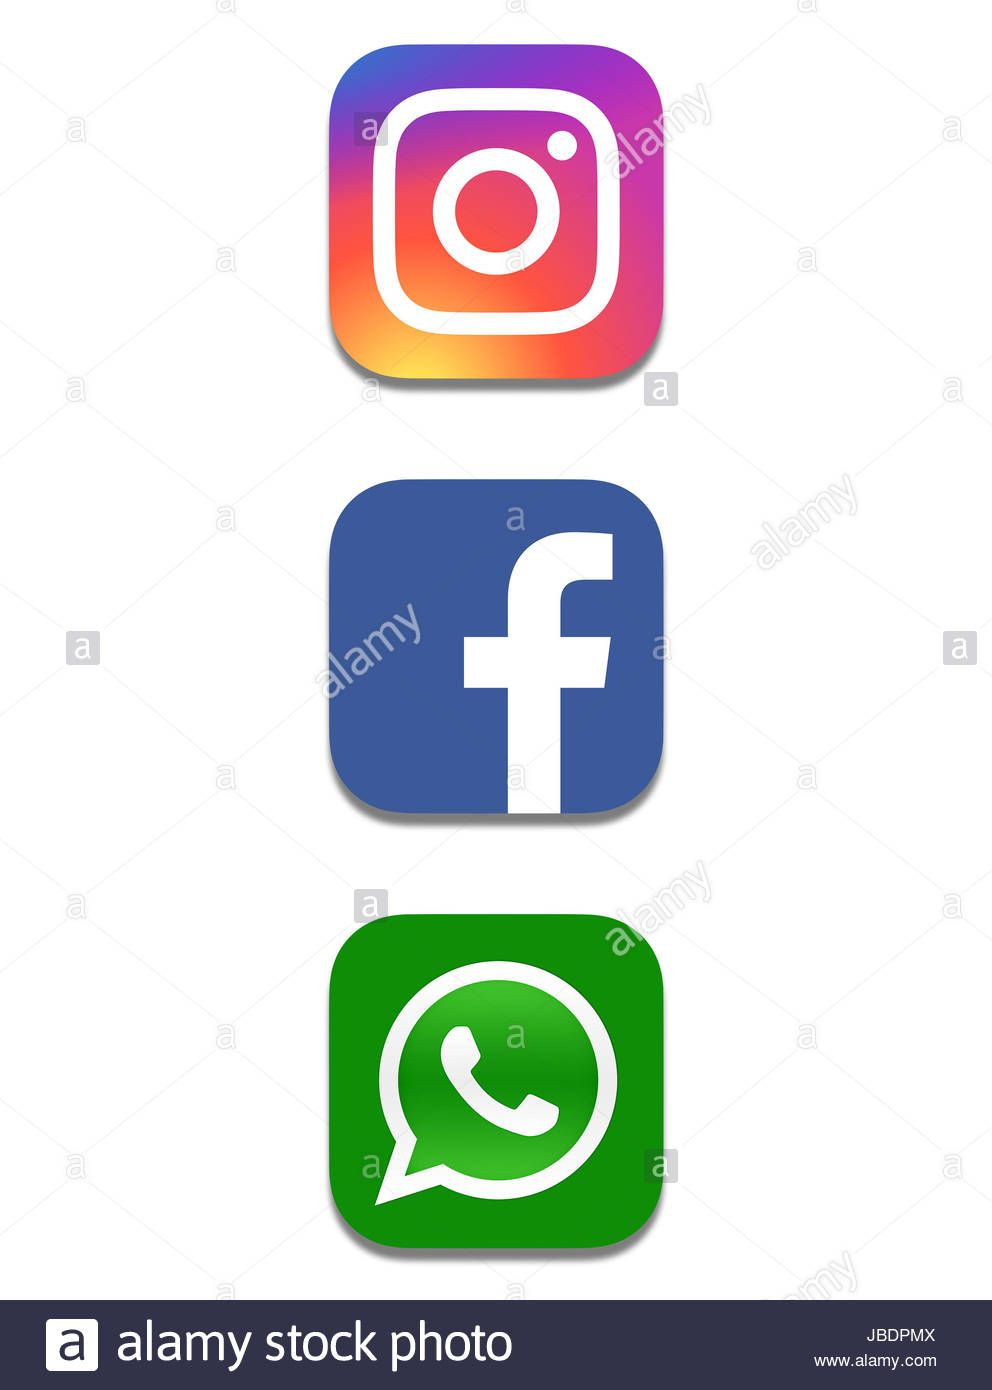 Pin By Nas Wari On My Saves Stock Photos Facebook Instagram Photo